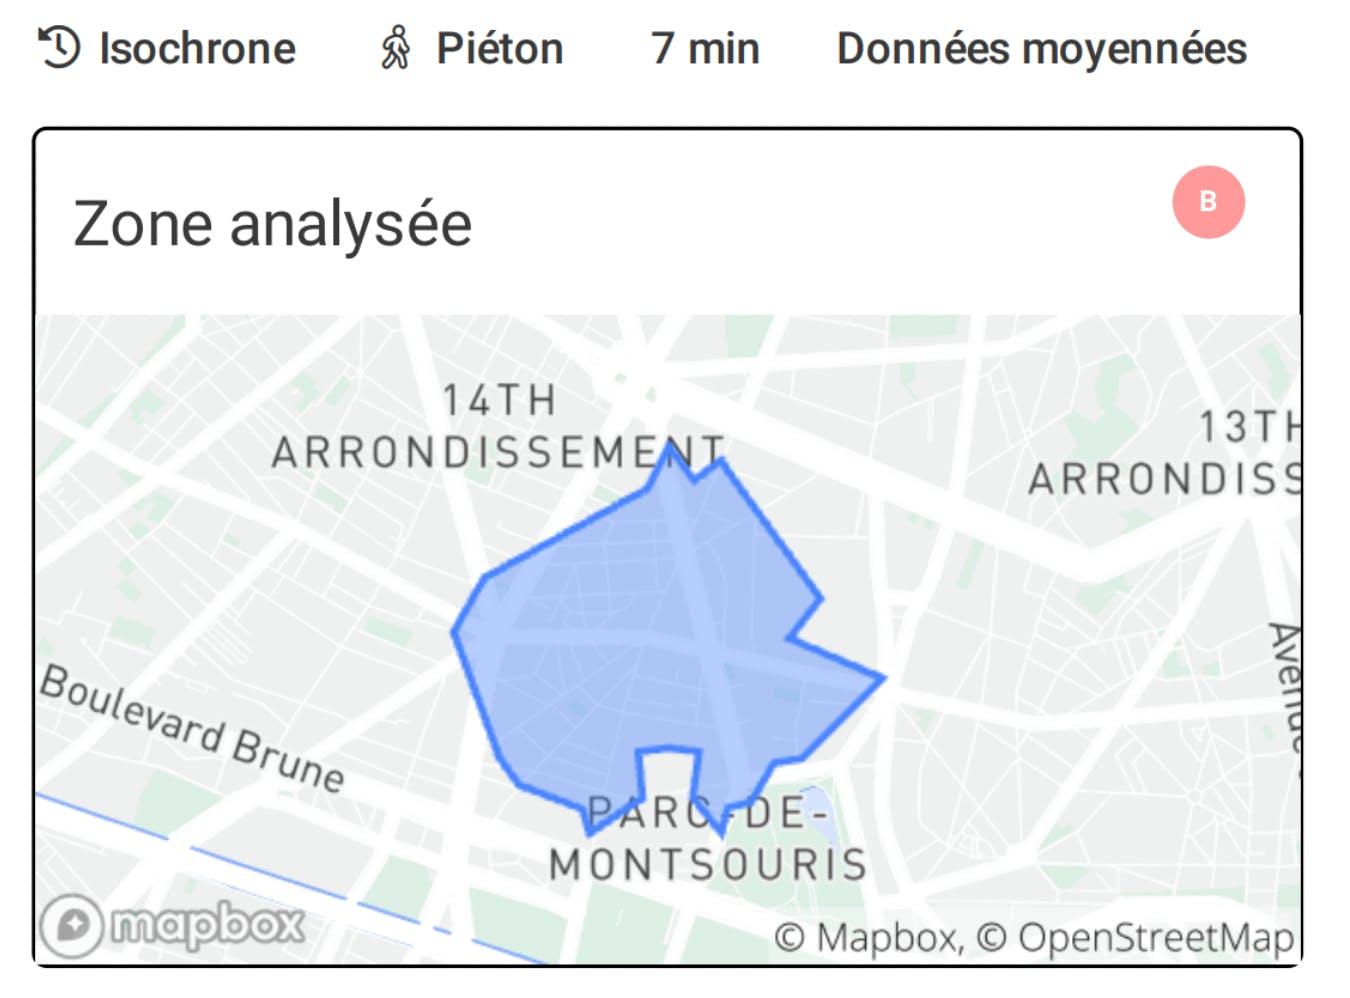 Analyse d'une zone